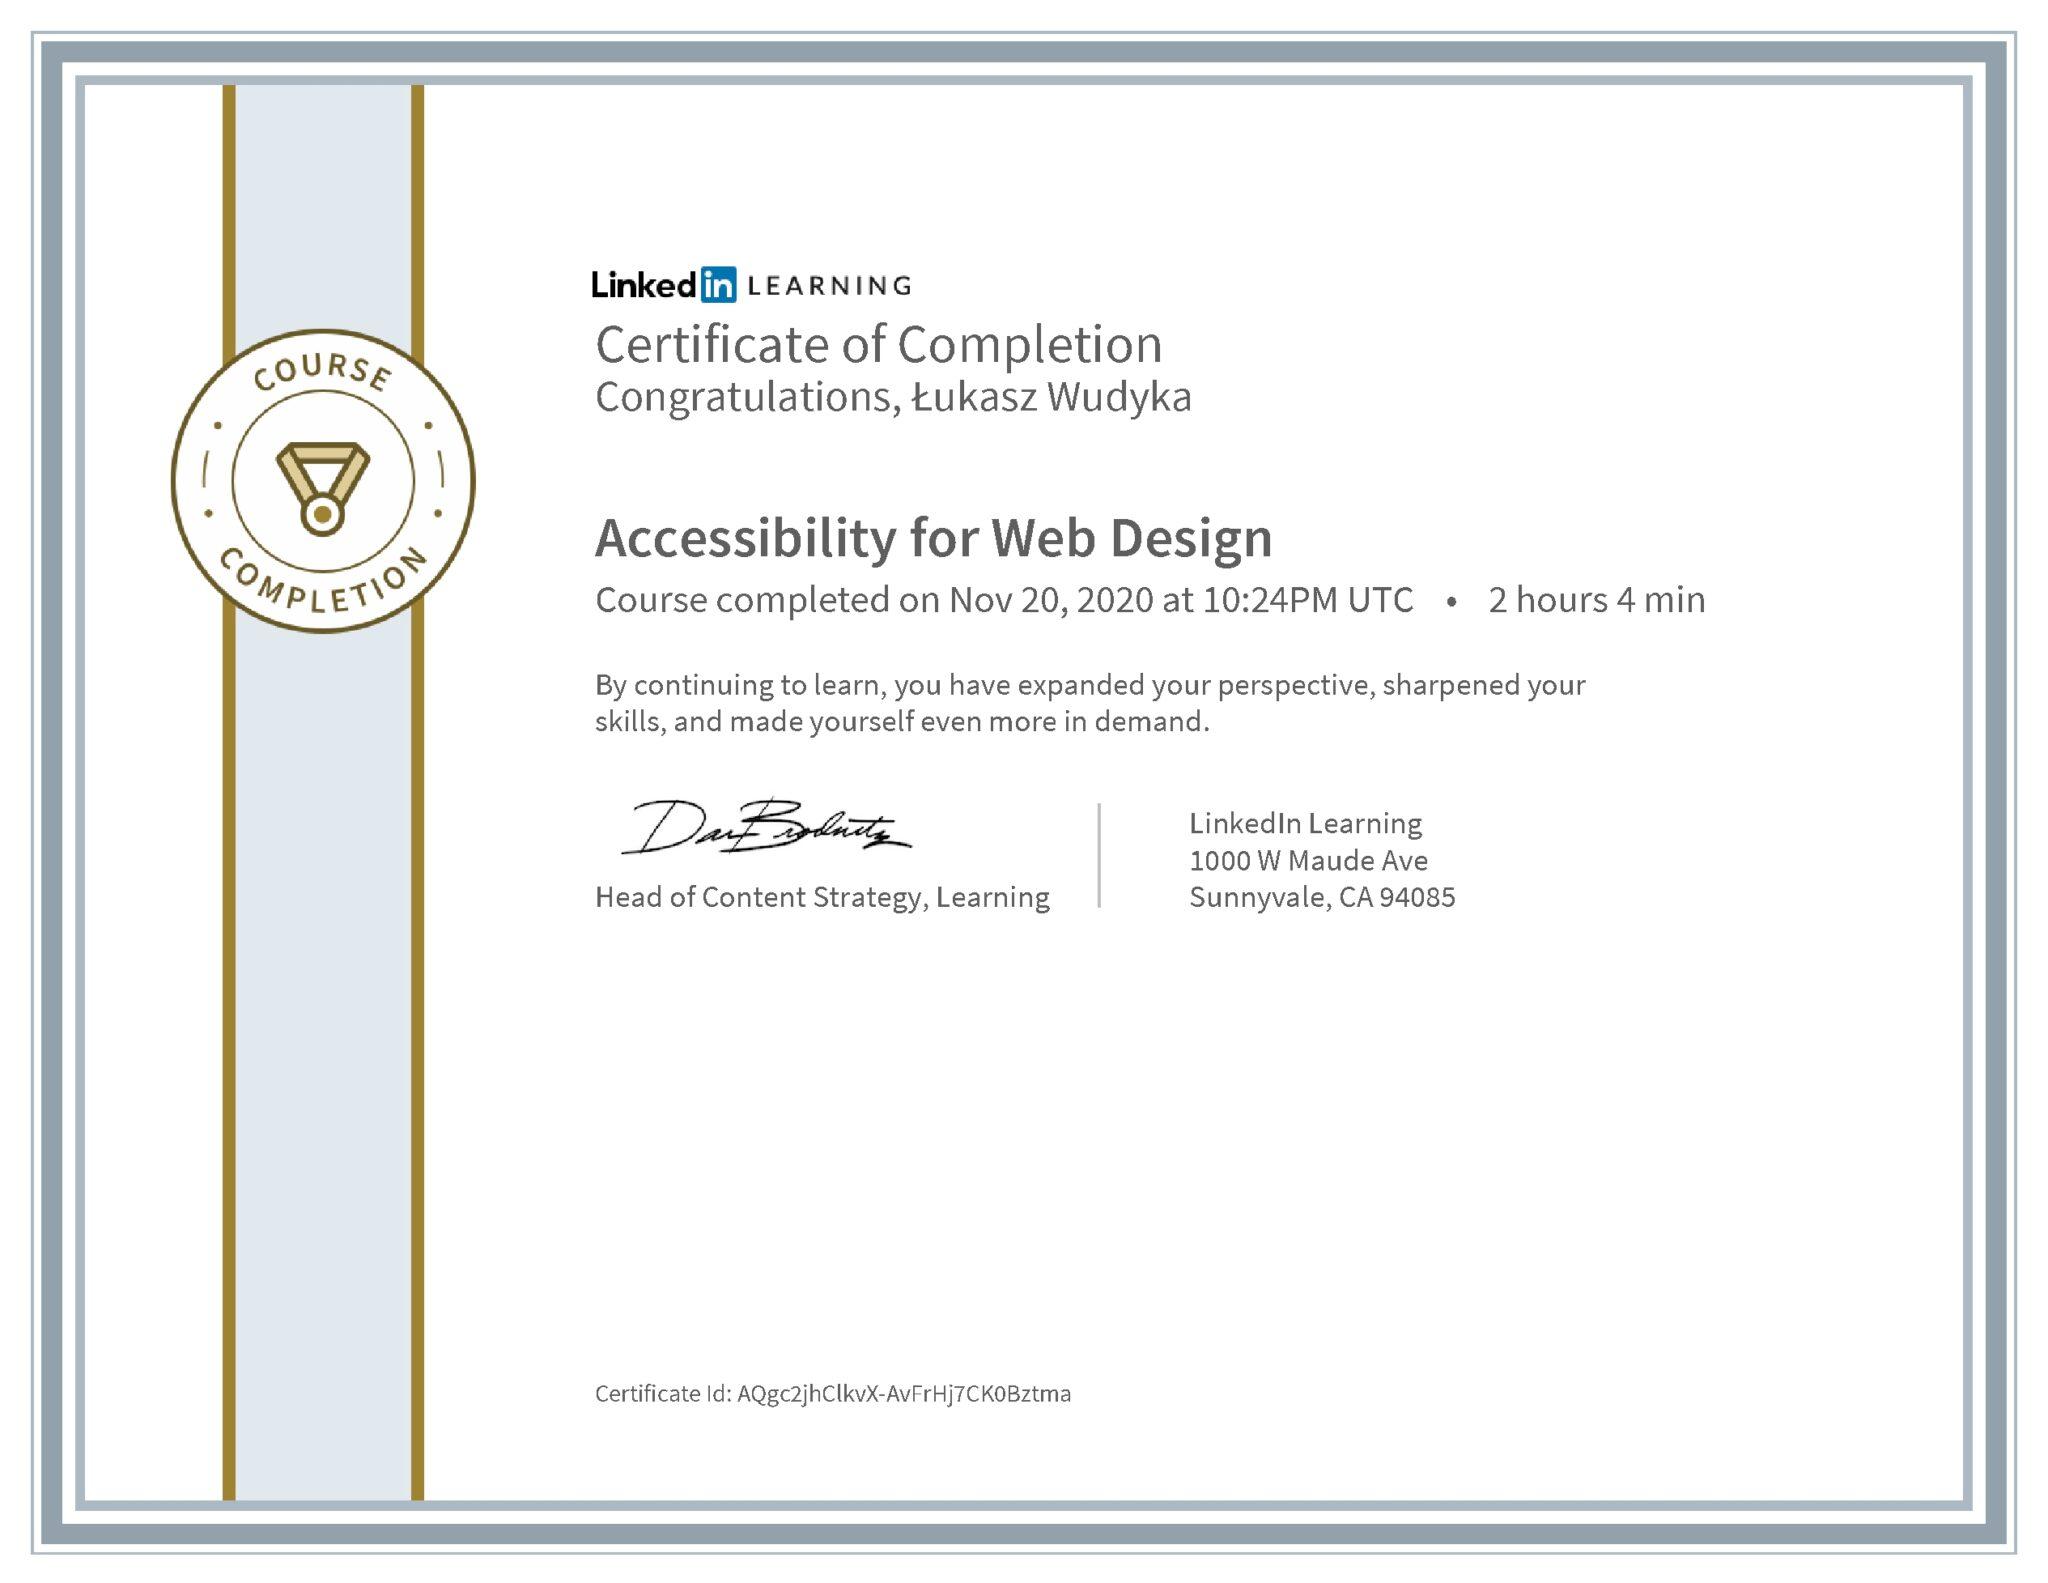 Łukasz Wudyka certyfikat LinkedIn Accessibility for Web Design